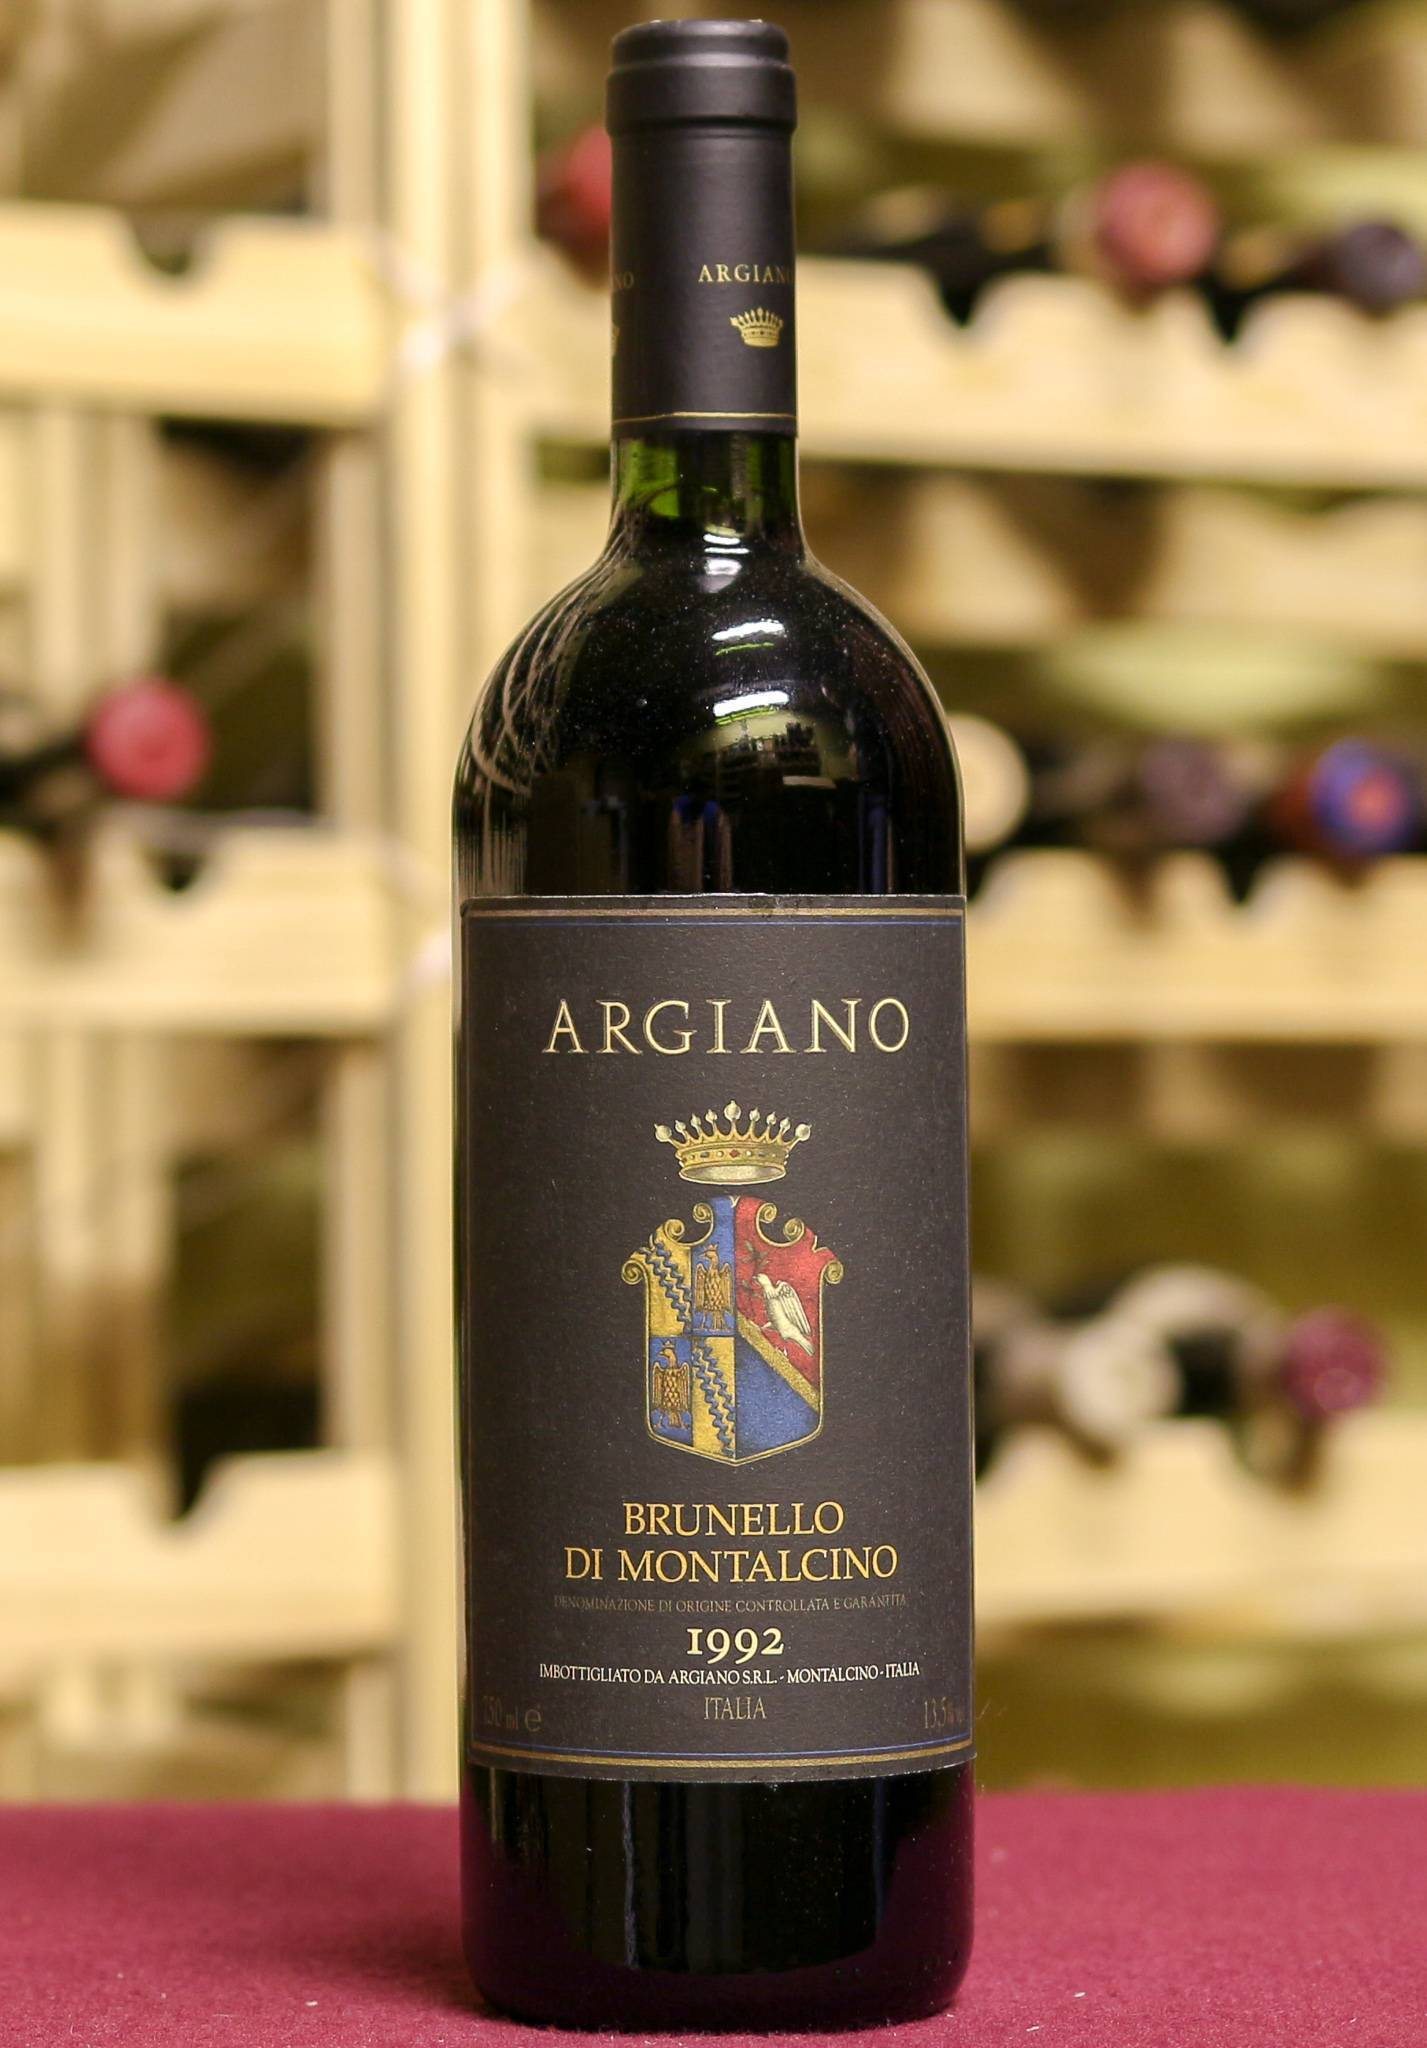 Характеристика вина брунелло ди монтальчино (brunello di montalcino)